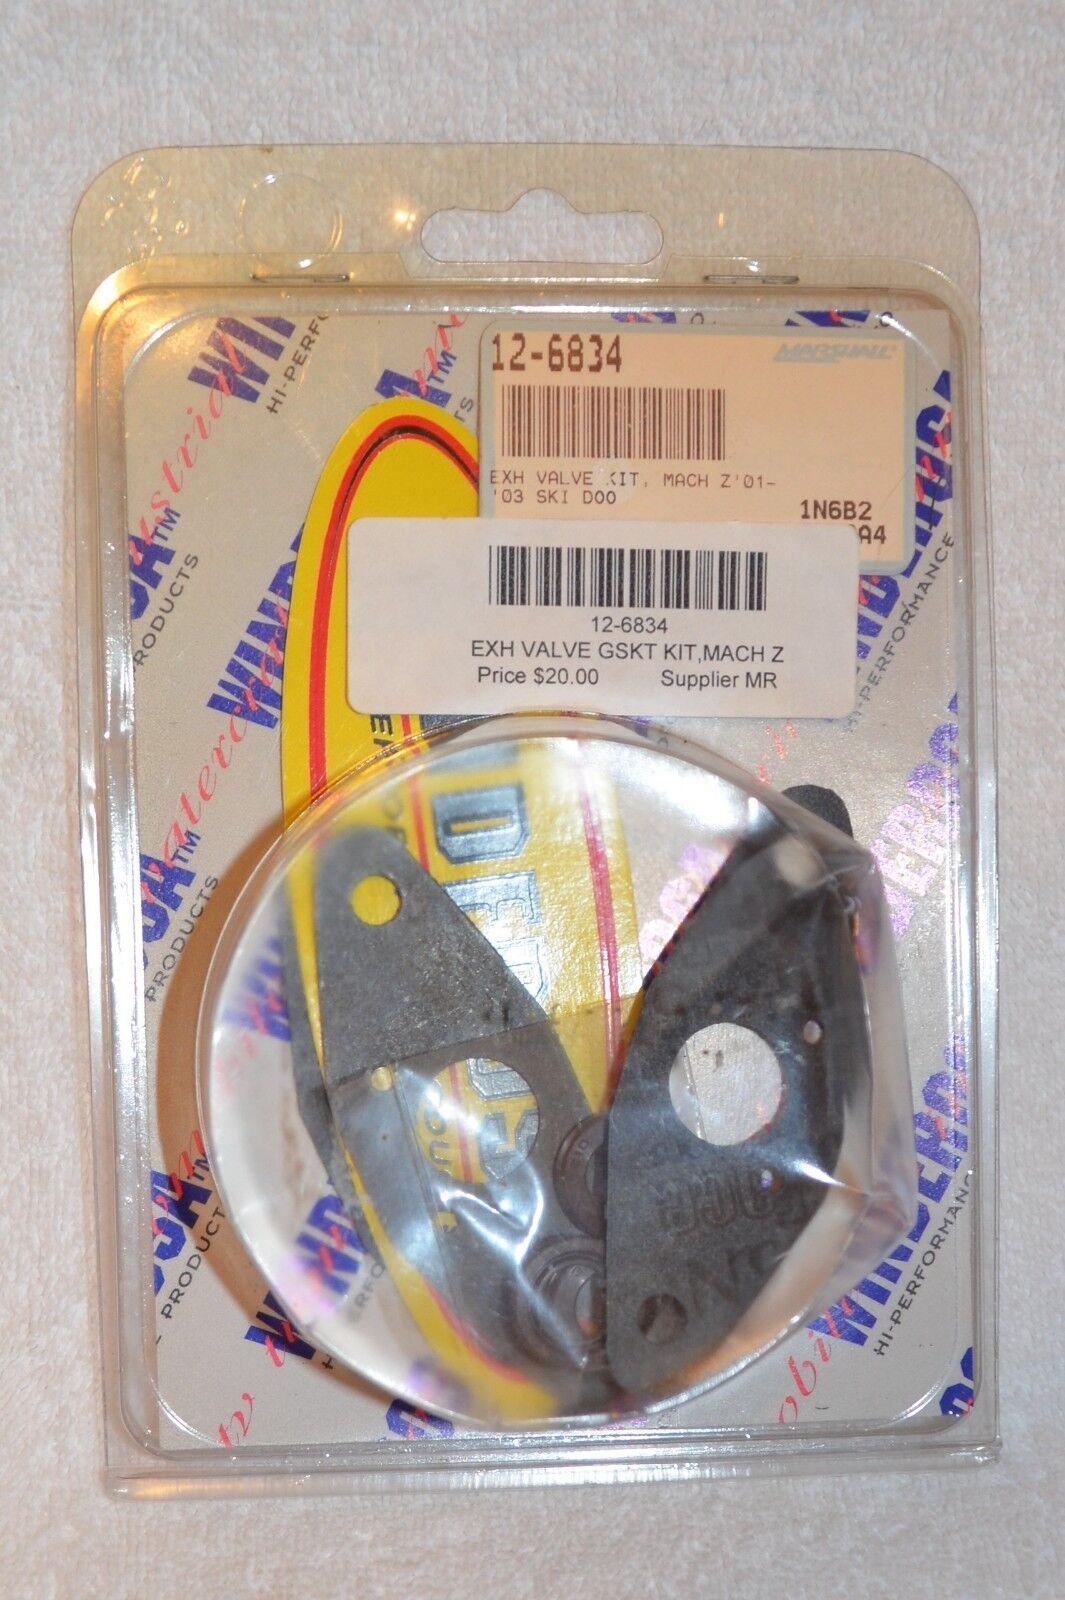 '01-'03 SKI-DOO MACH Z 800  EXHAUST VALVE GASKET KIT MACH Z800 / 719116 /12-6834